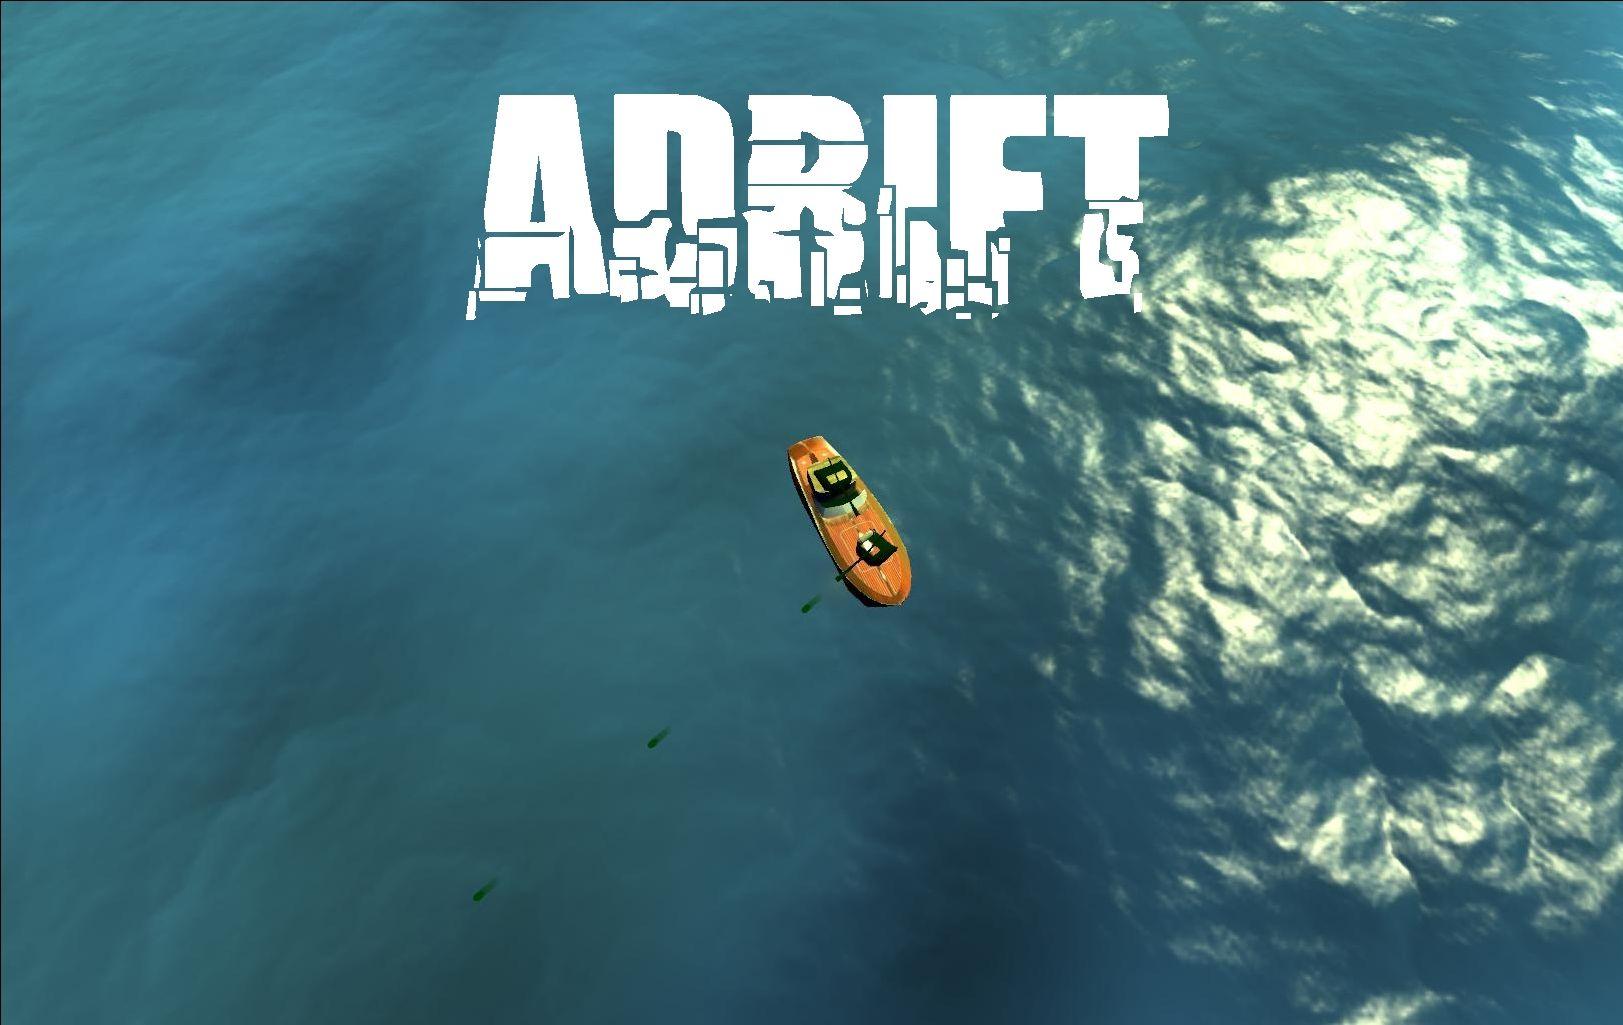 Adrift Backgrounds, Compatible - PC, Mobile, Gadgets| 1623x1025 px